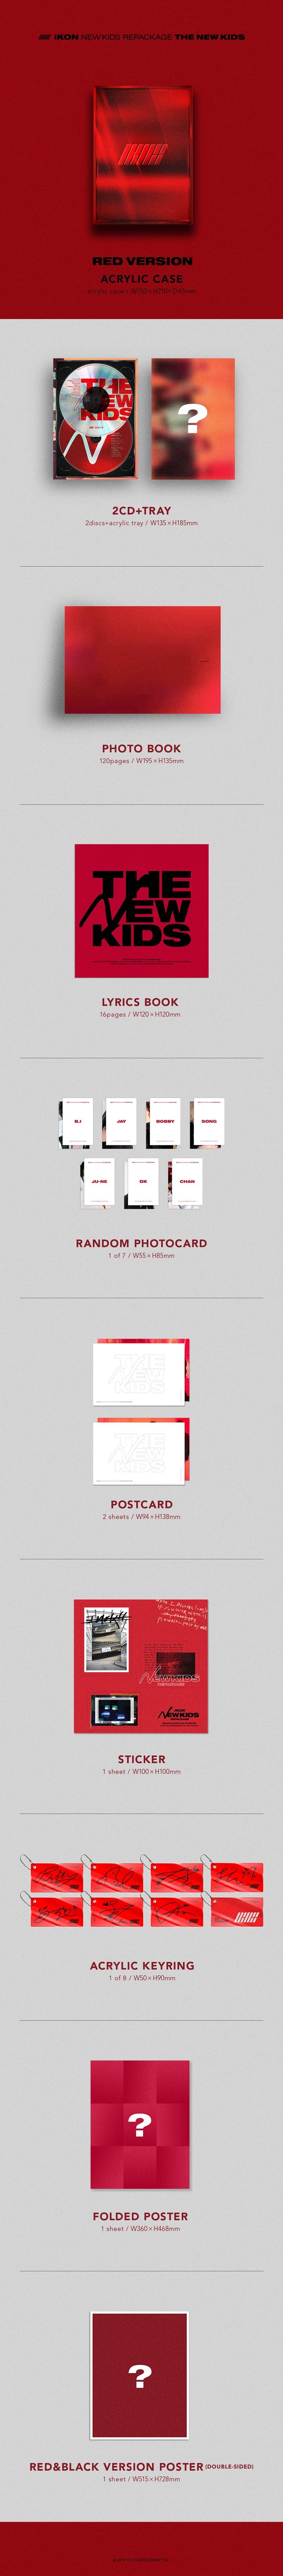 iKON - NEW KIDS REPACKAGE Album [THE NEW KIDS] หน้าปก RED Ver